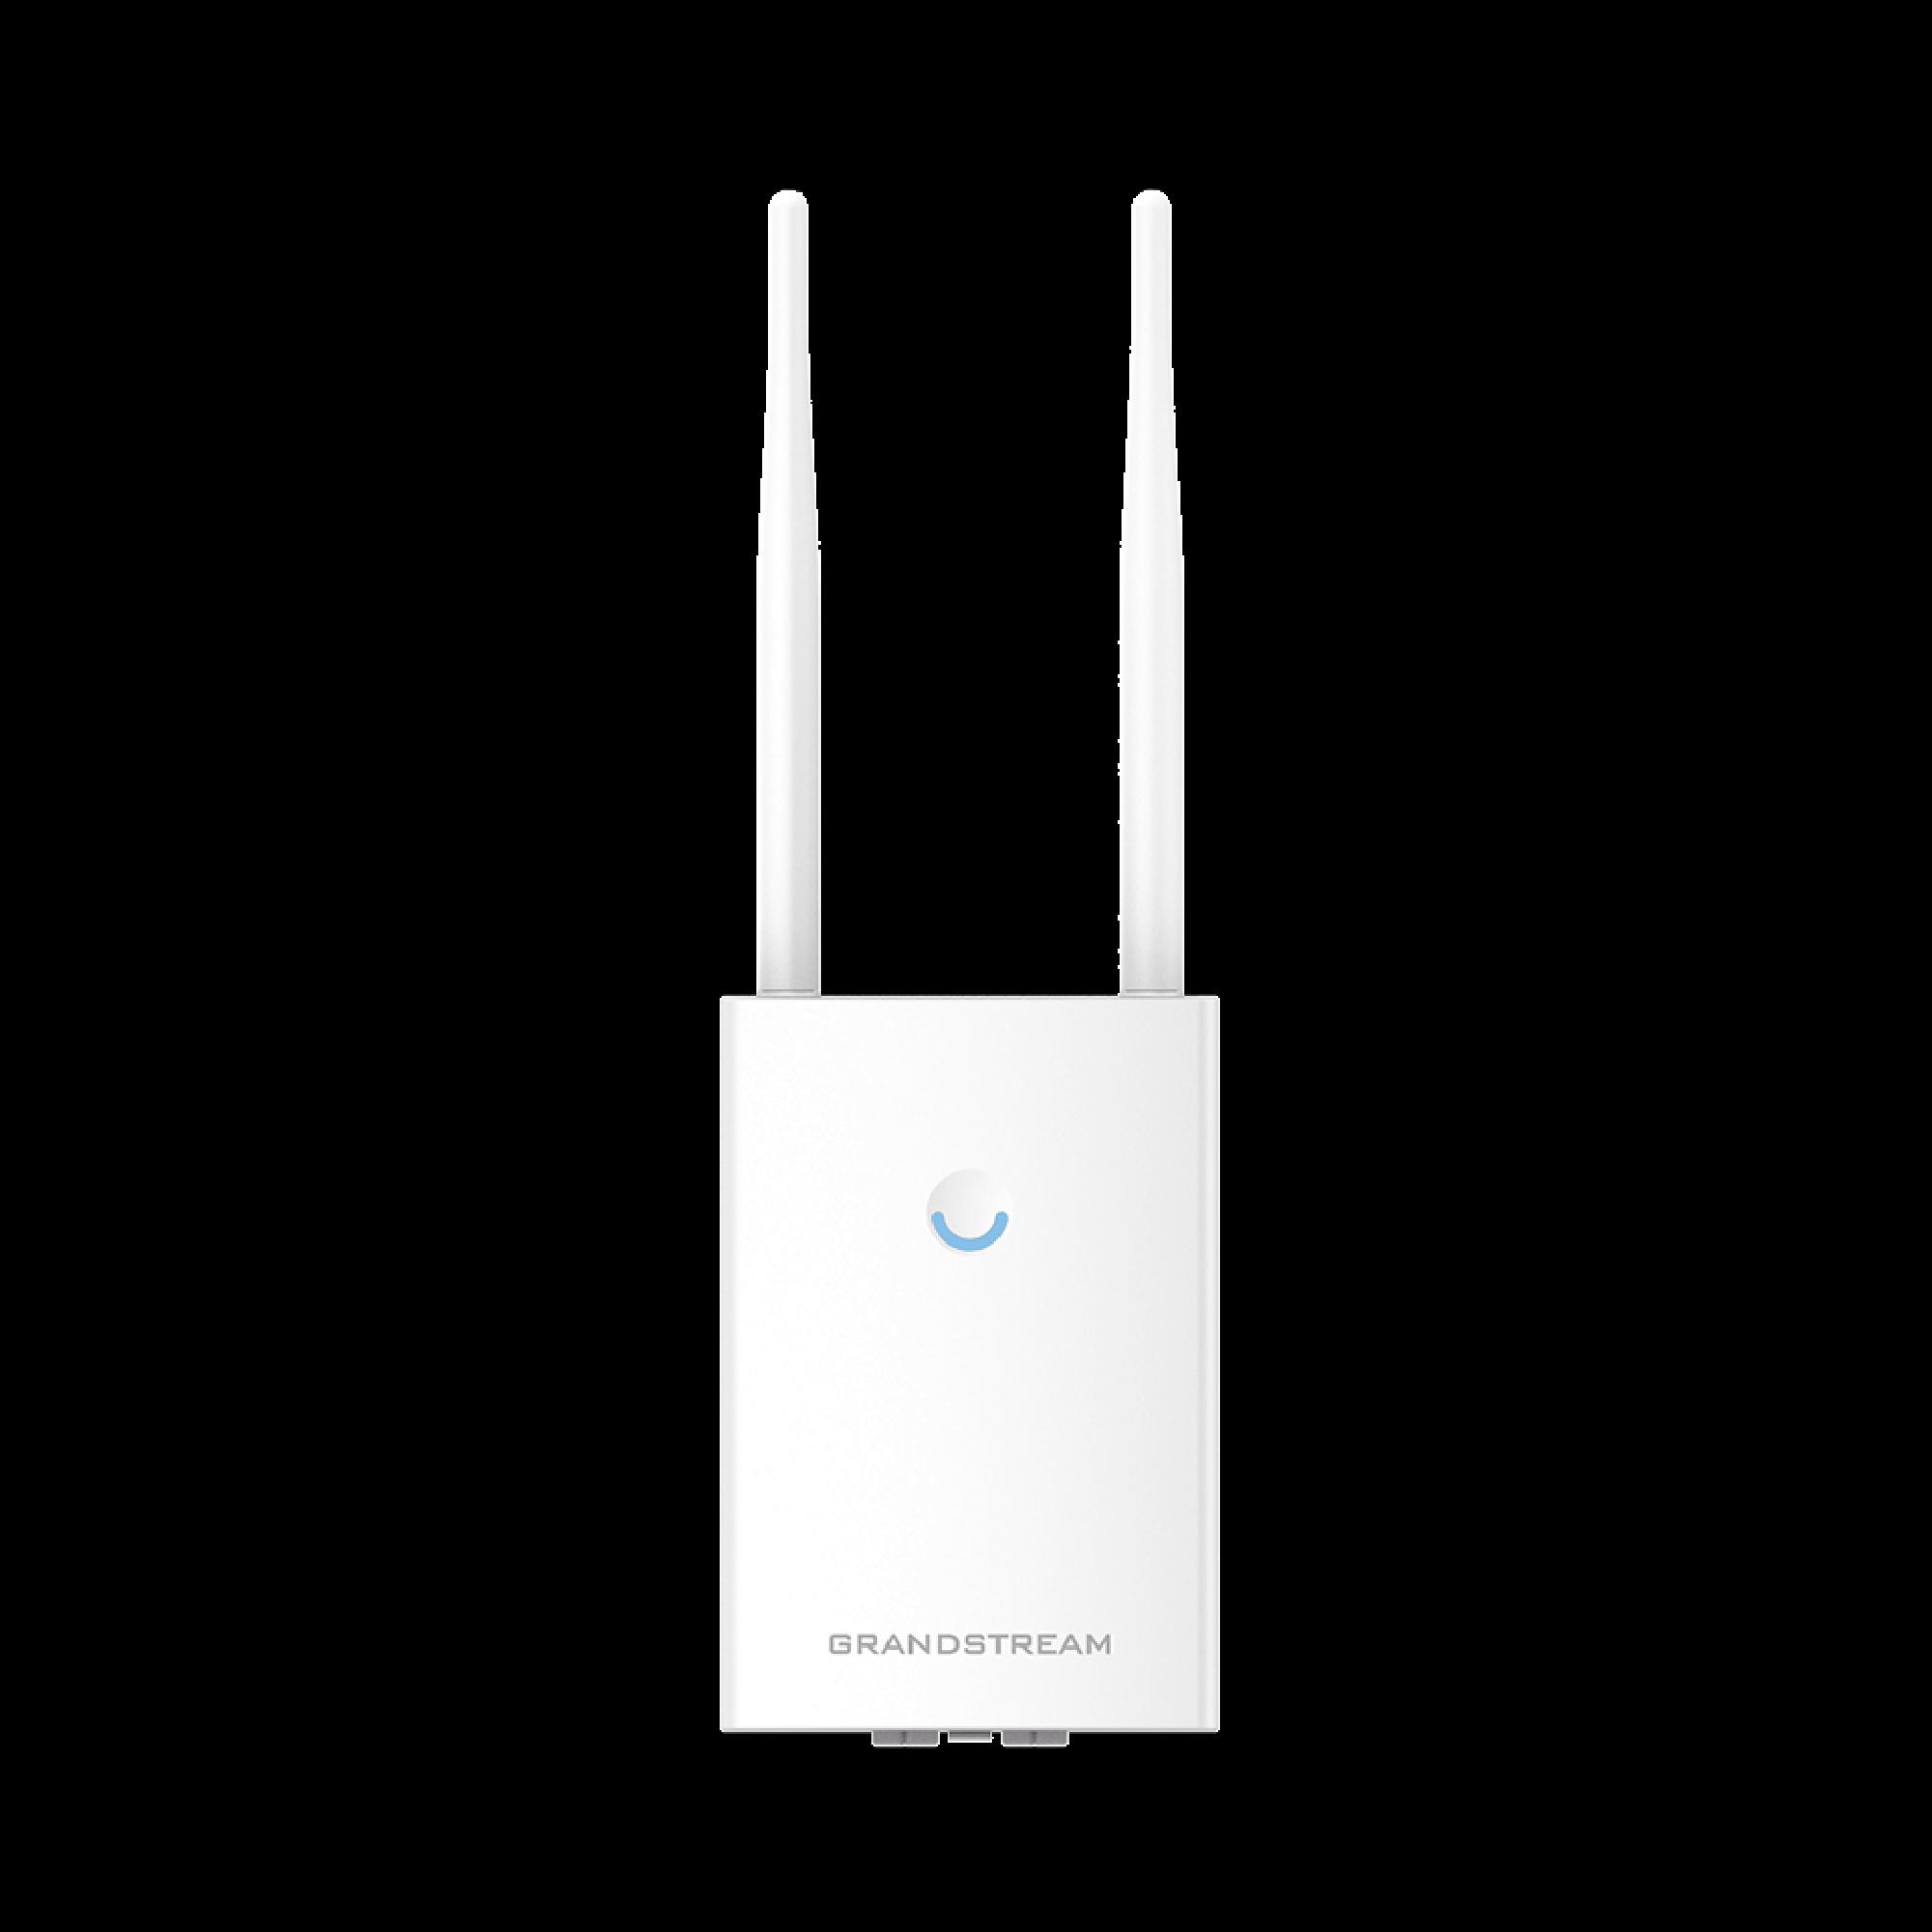 Punto de acceso para exterior Wi-Fi 802.11 ac 1.27 Gbps, Wave-2, MU-MIMO 2x2:2 con administración desde la nube gratuita o stand-alone, controlador integrado para hasta 50 APs.